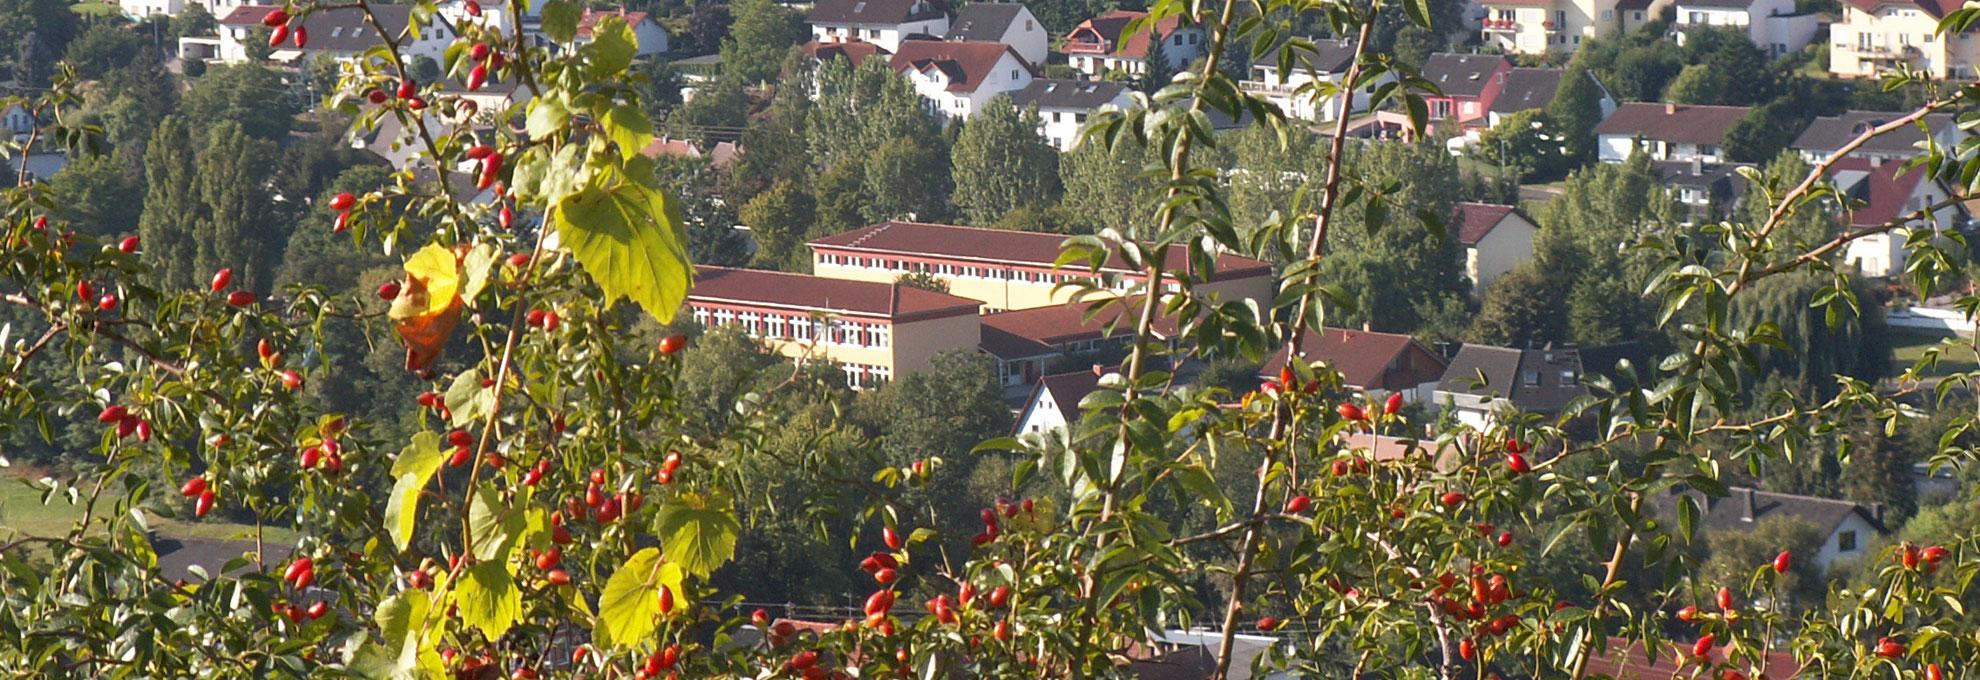 Grundschule Guldental